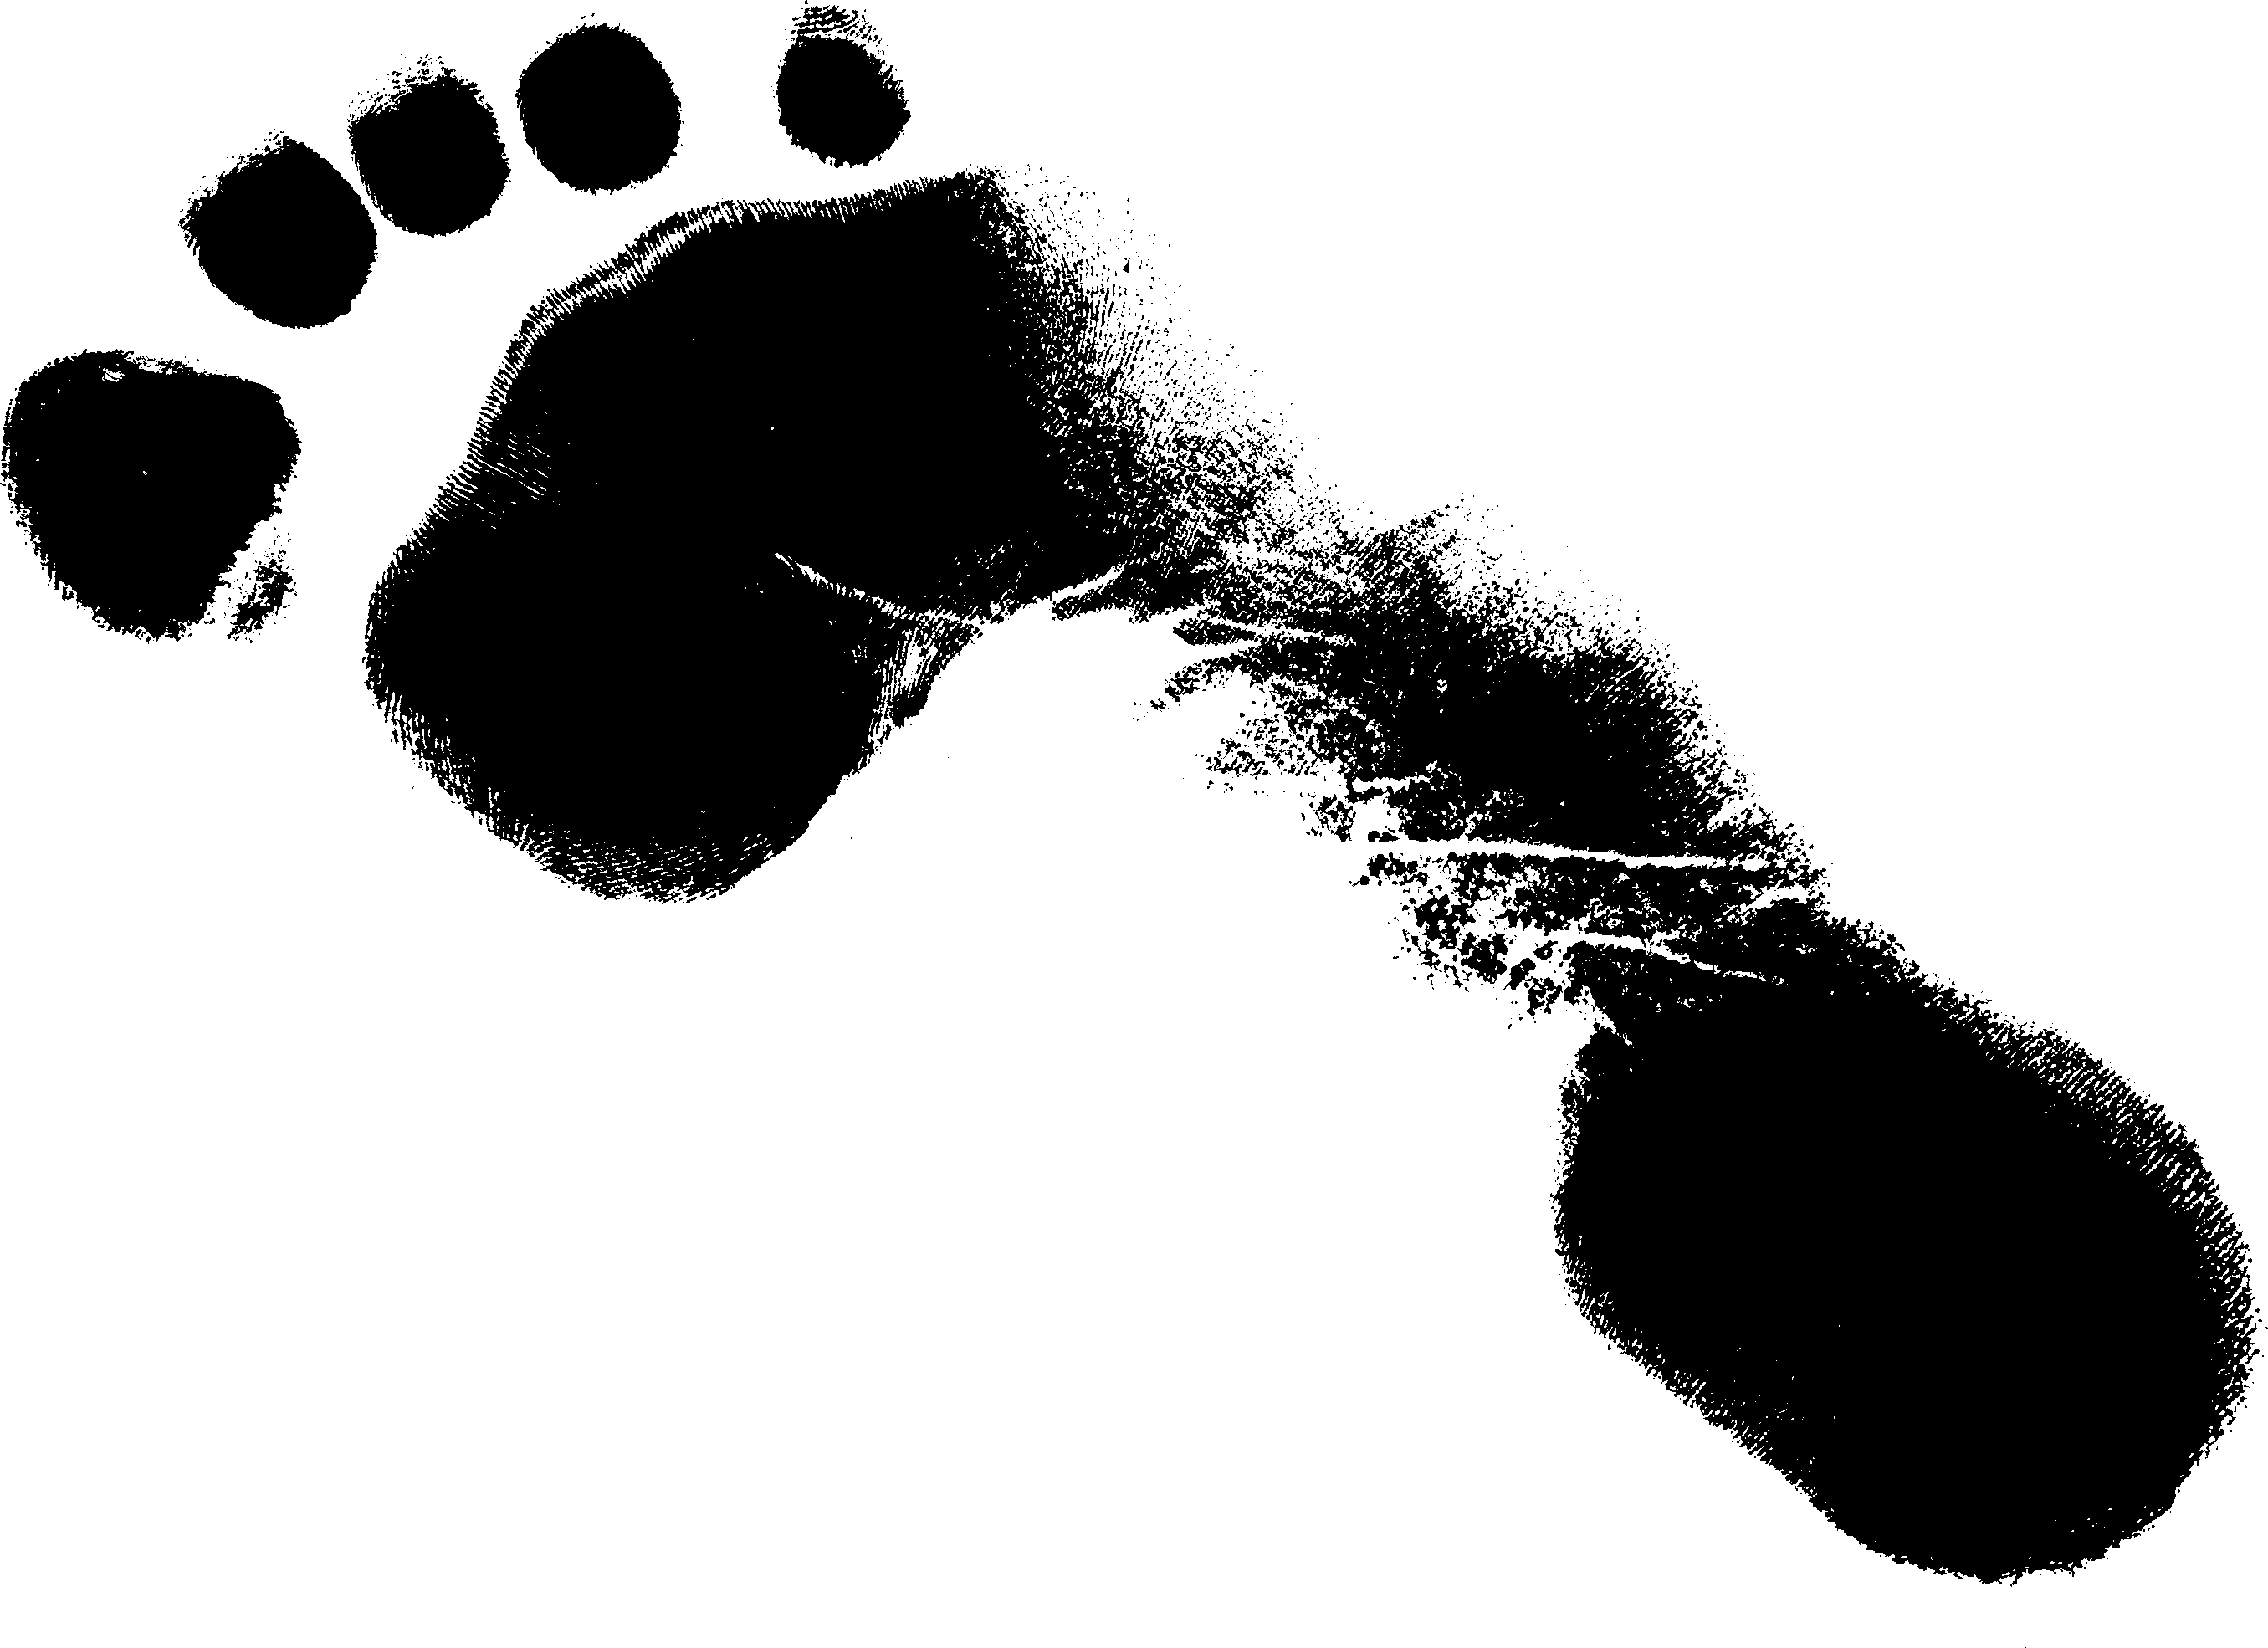 9 Grunge Footprint (PNG Transparent).